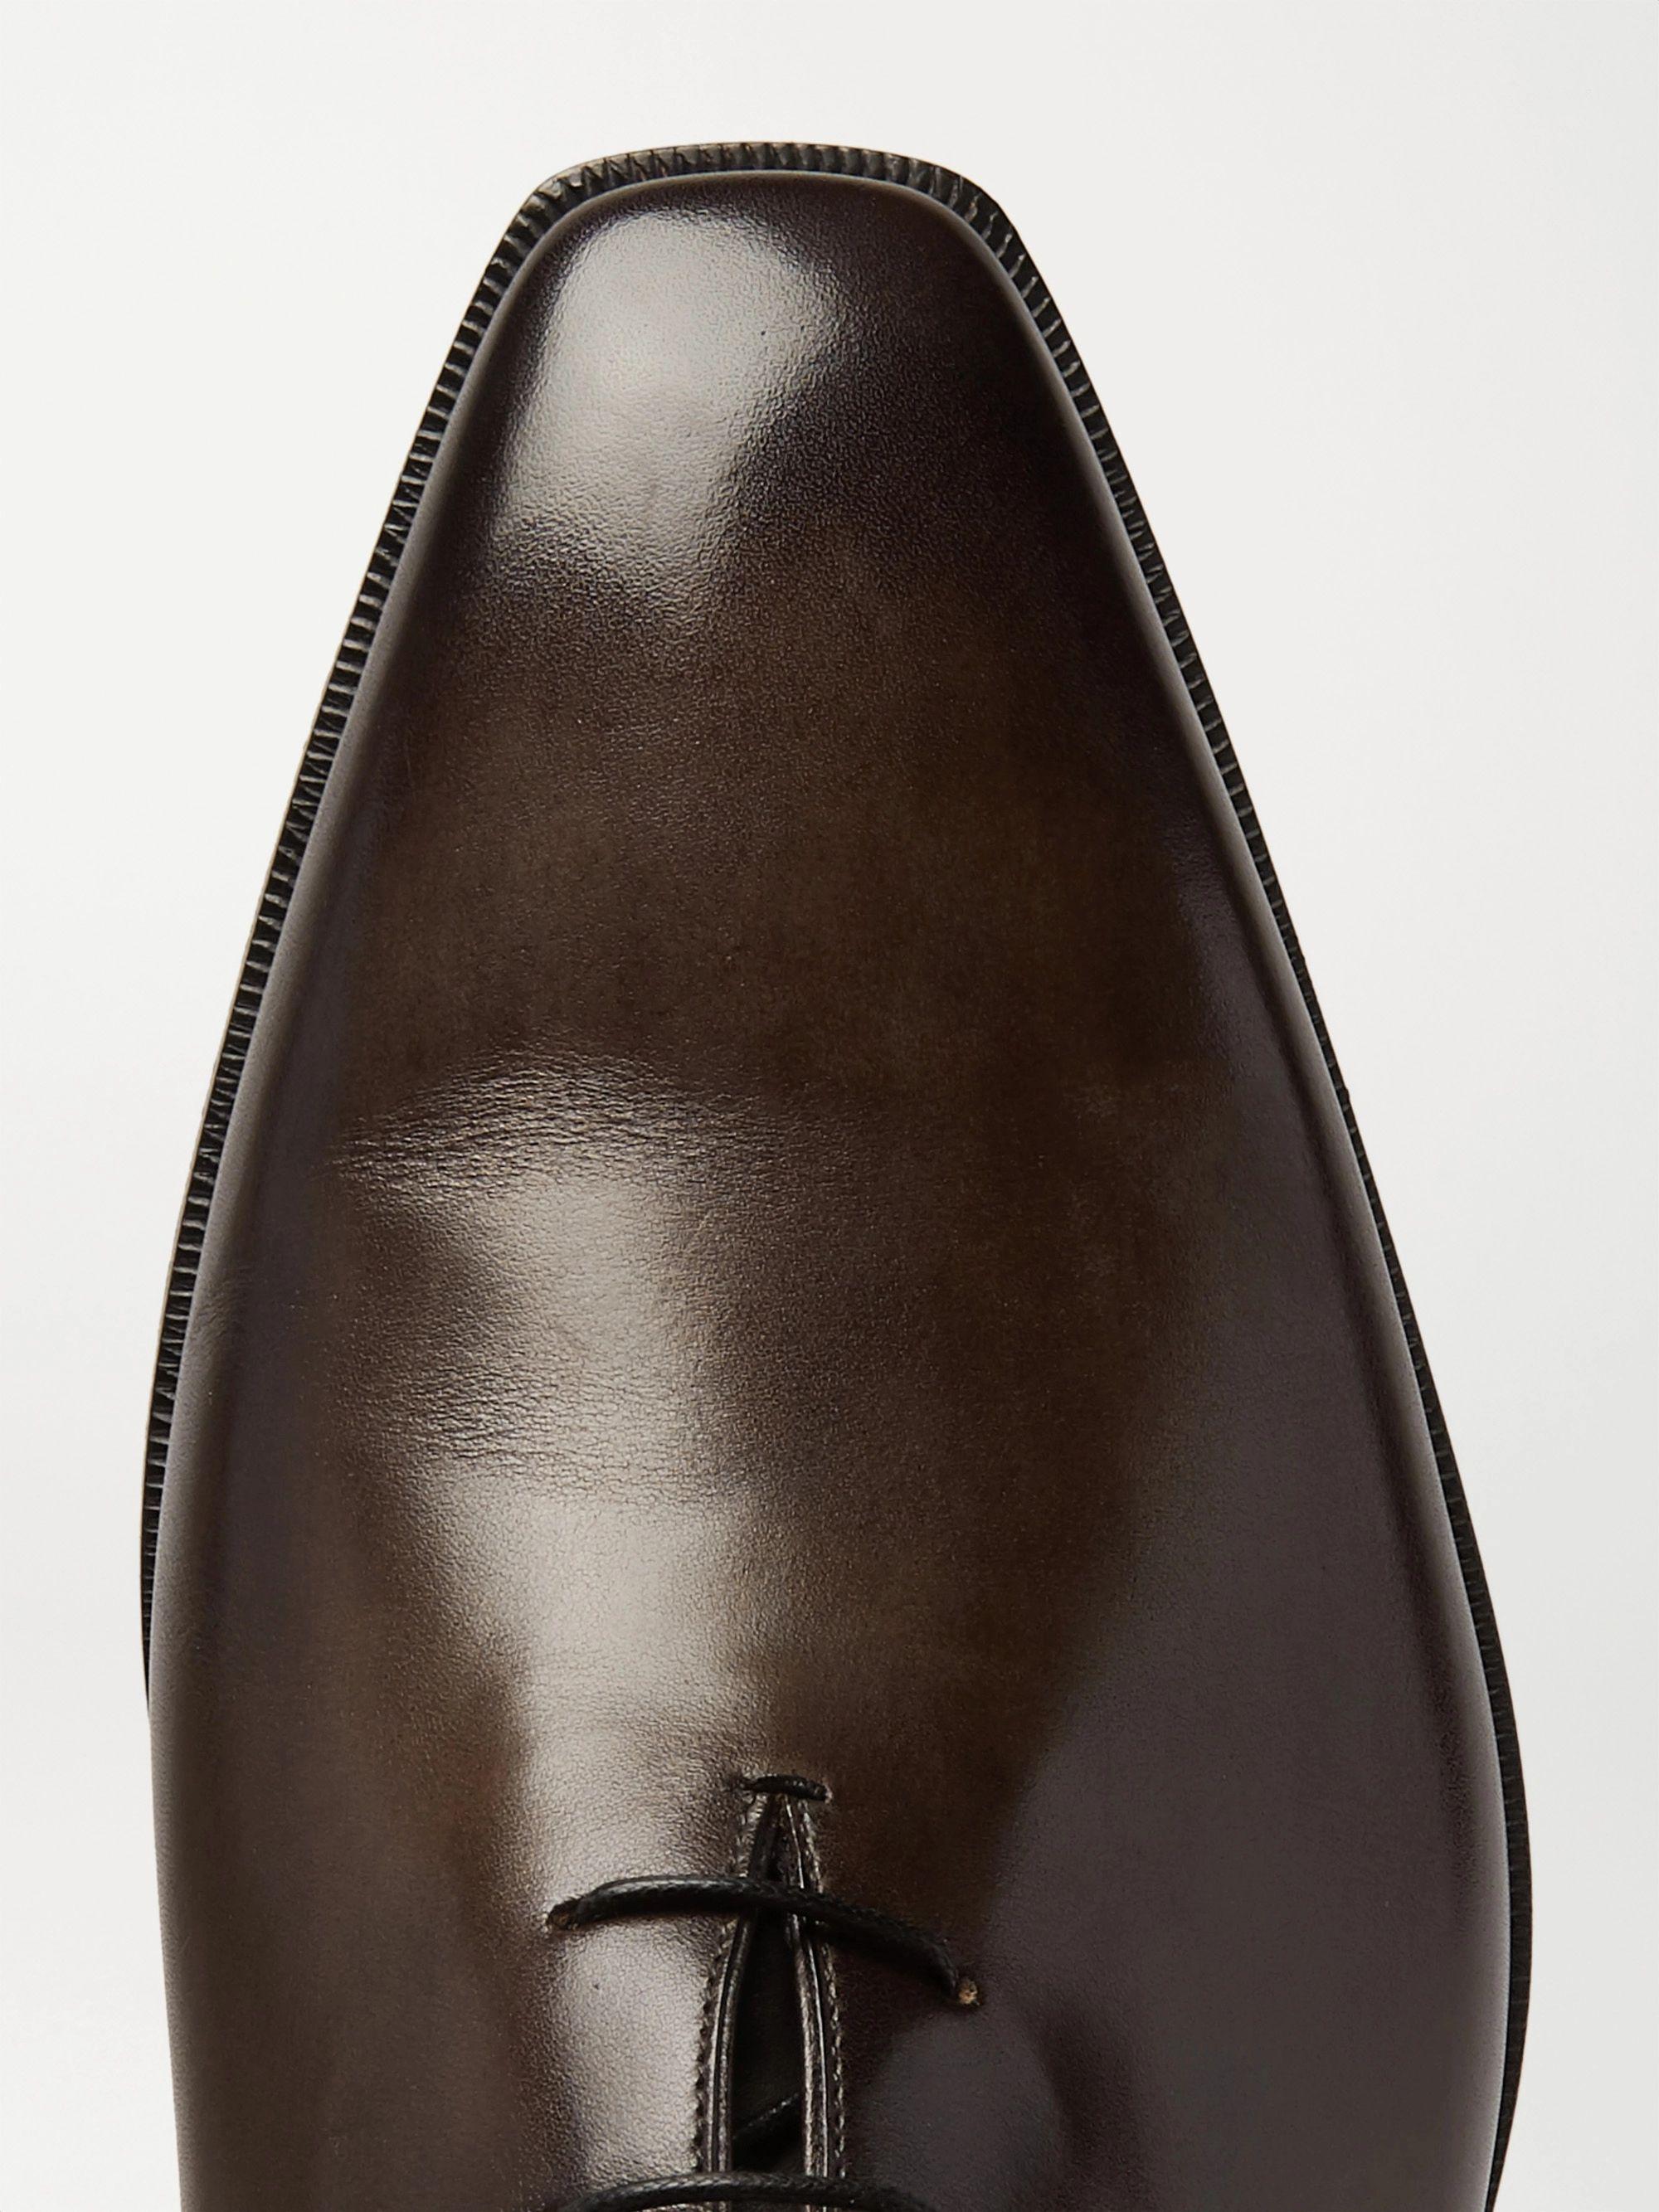 Dark Brown Venezia Whole-cut Leather Oxford Shoes   Berluti